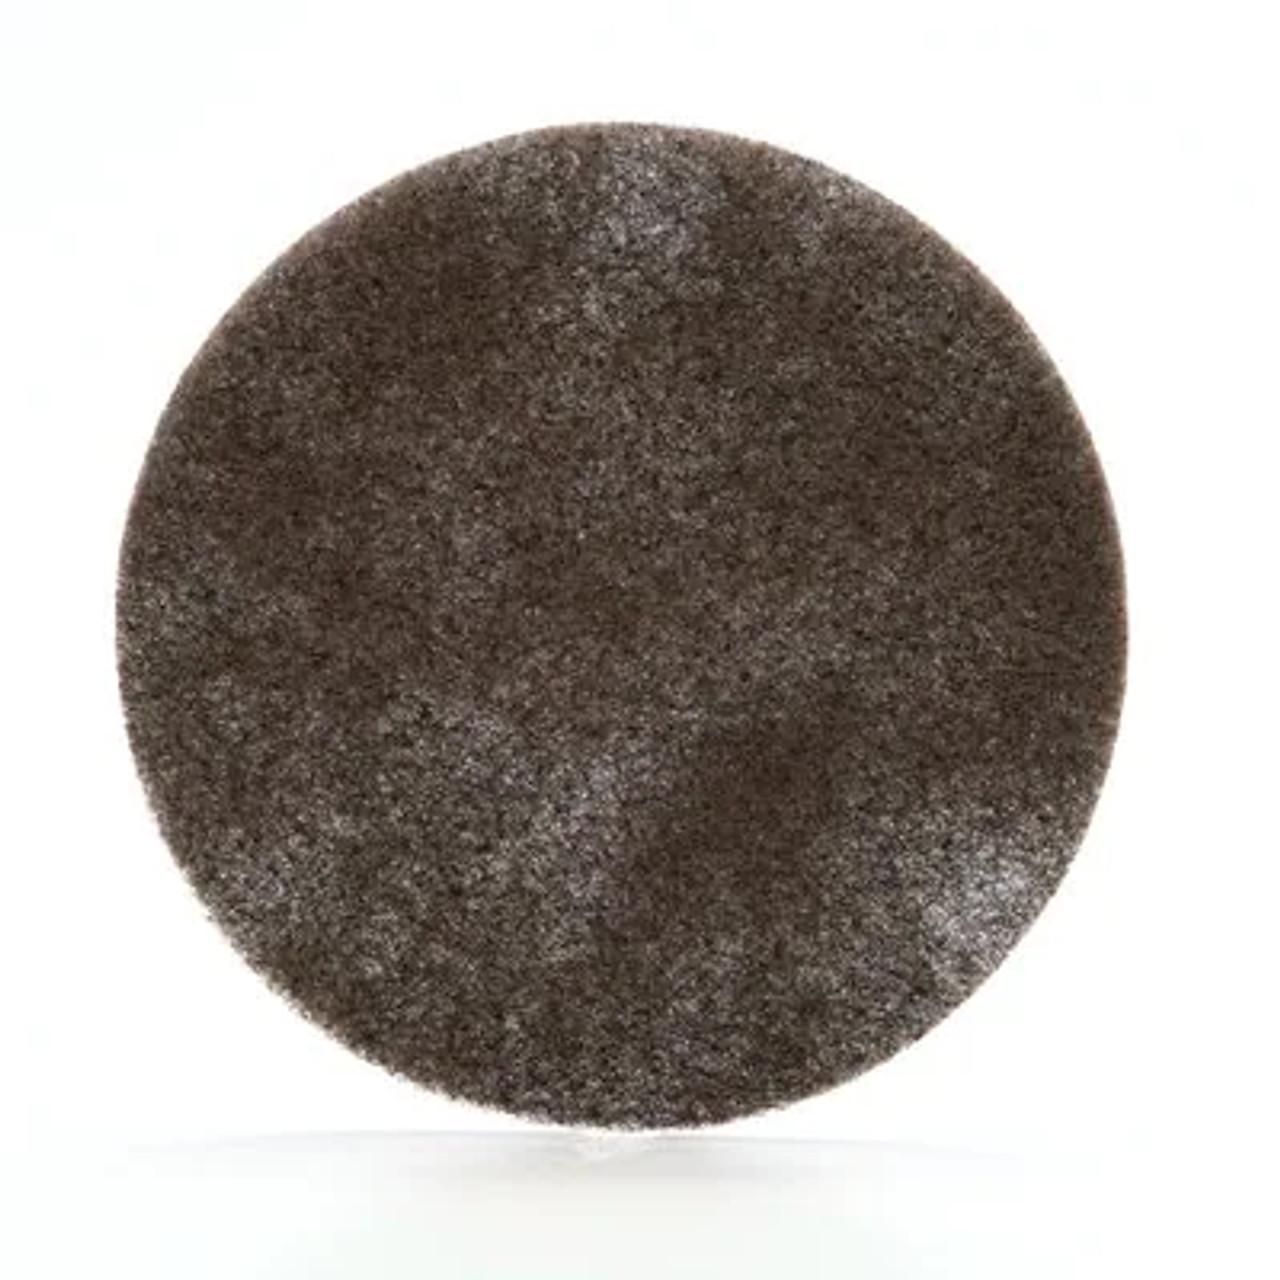 Scotch-Brite™ Hookit™ Clean and Finish Disc, 11-1/4 in x NH S ULF